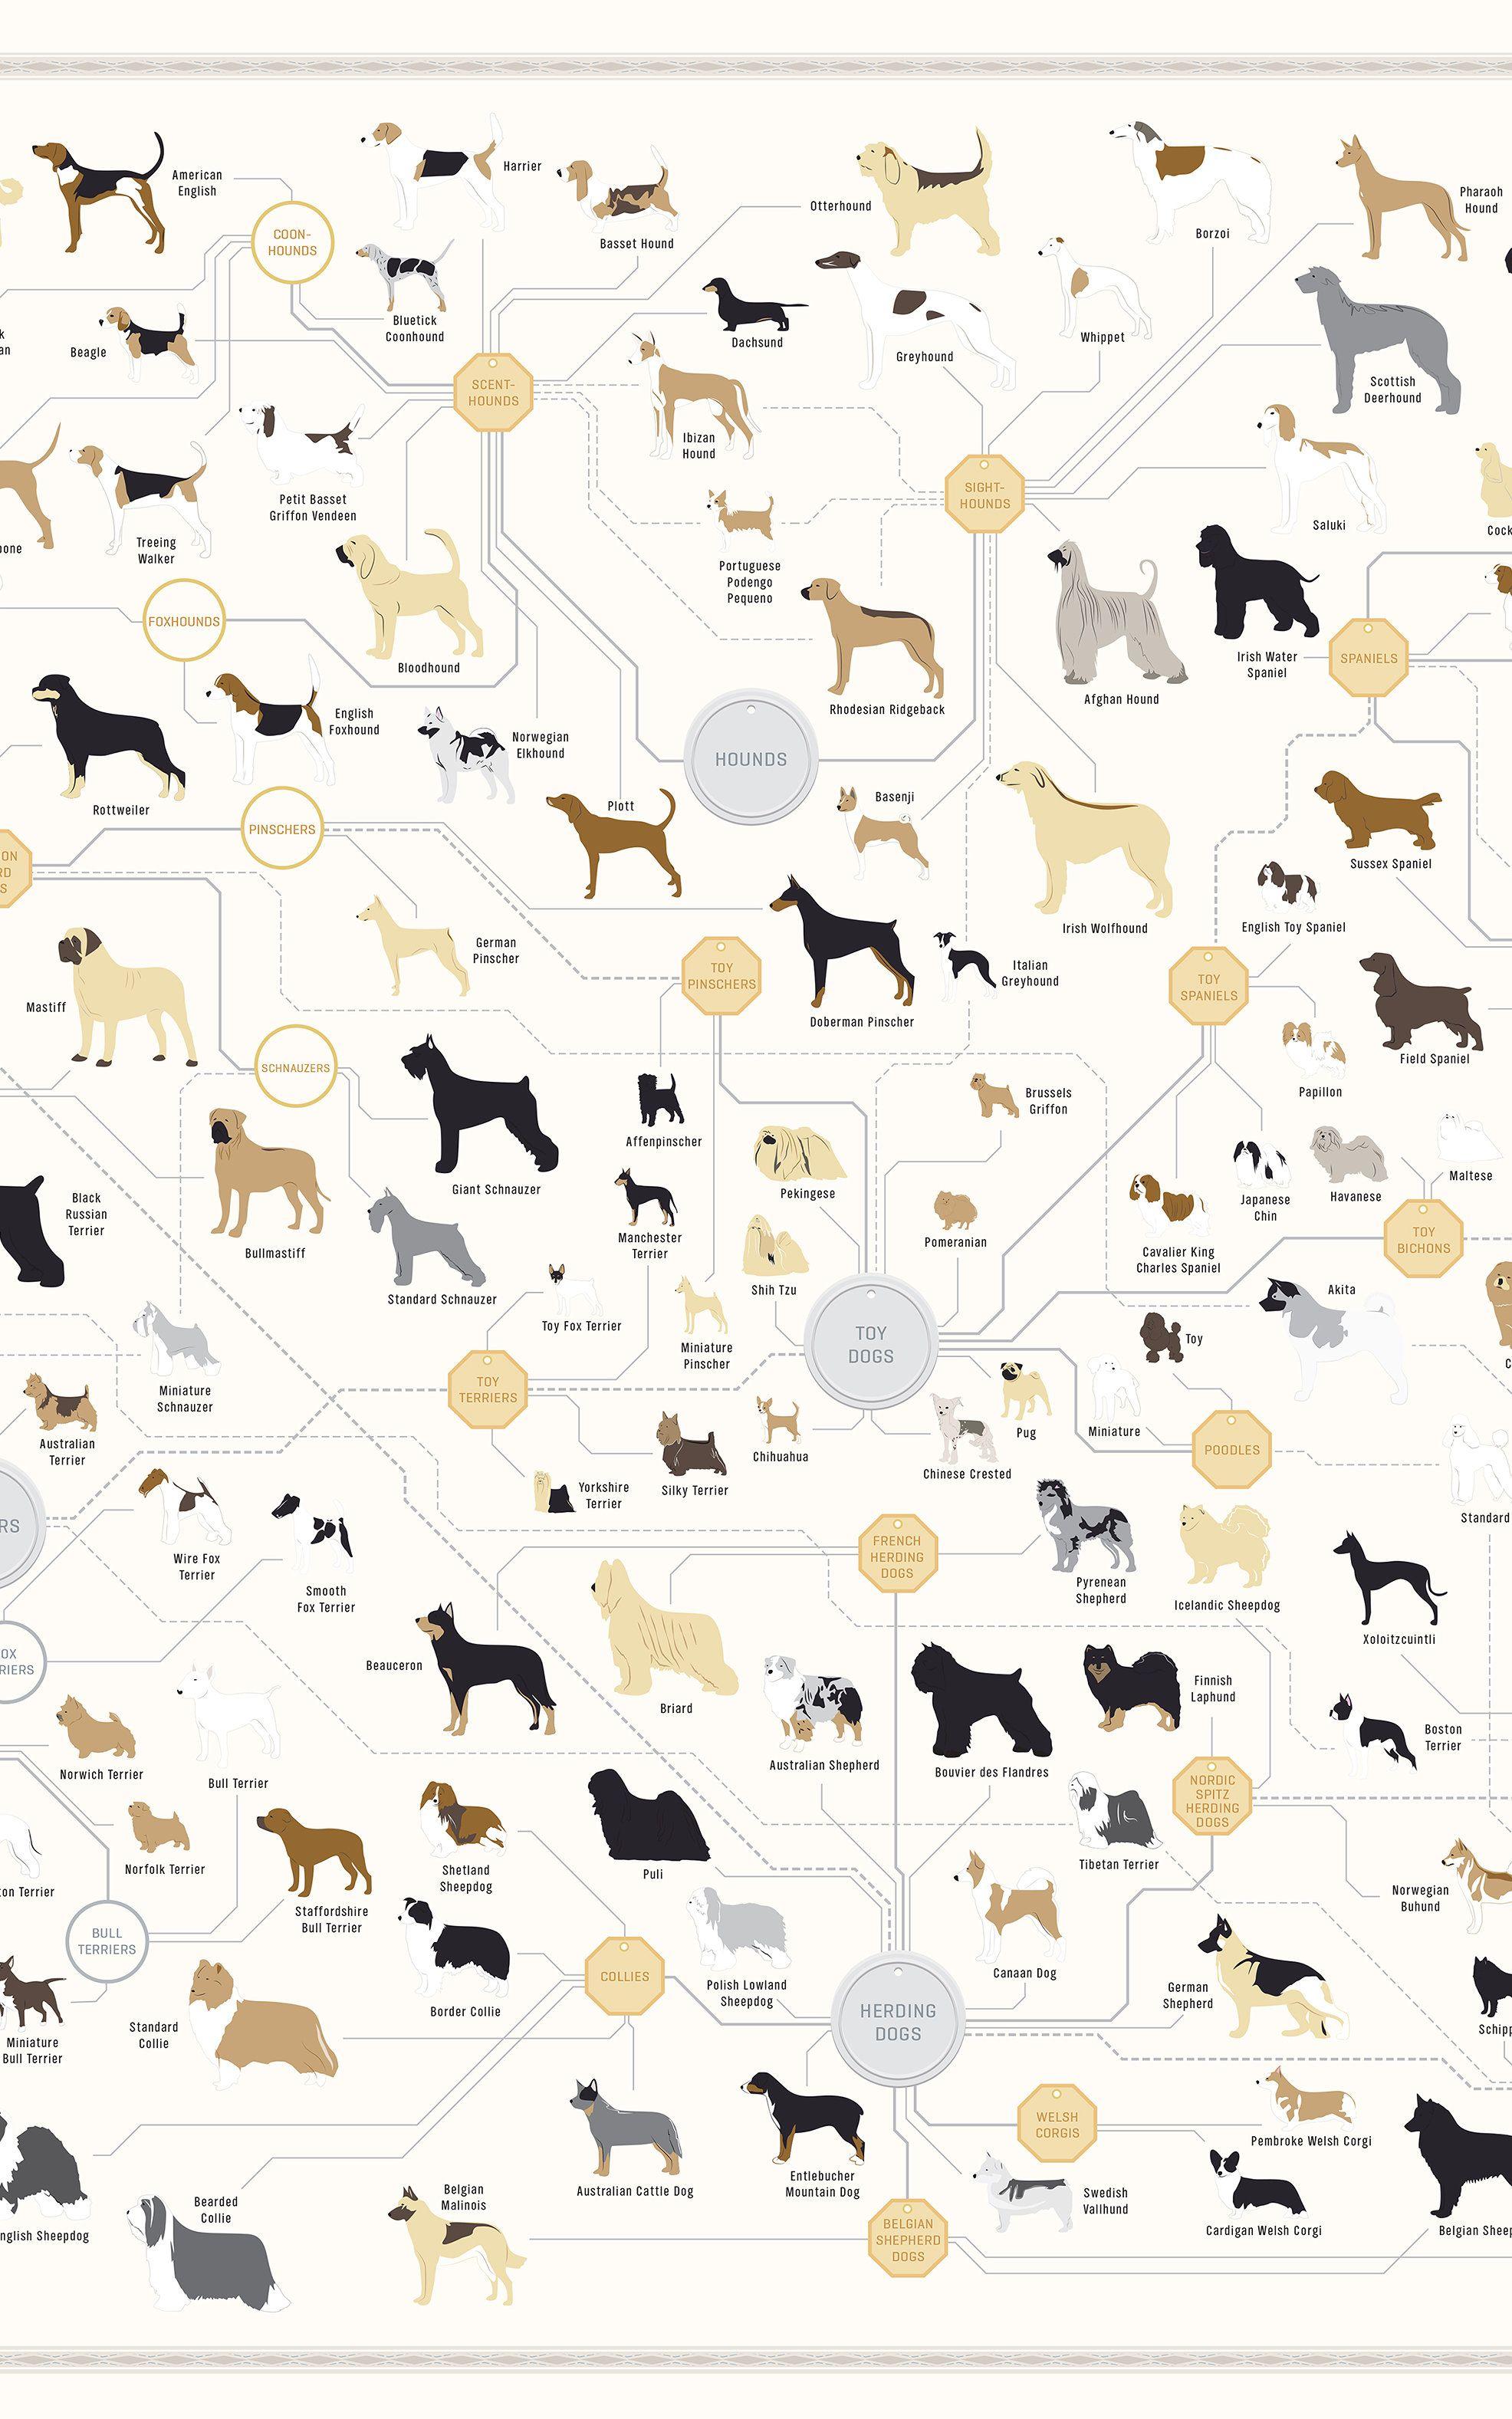 181 Breeds Of Dog On One Awesome Poster | Pfoten, Hunde und Anatomie